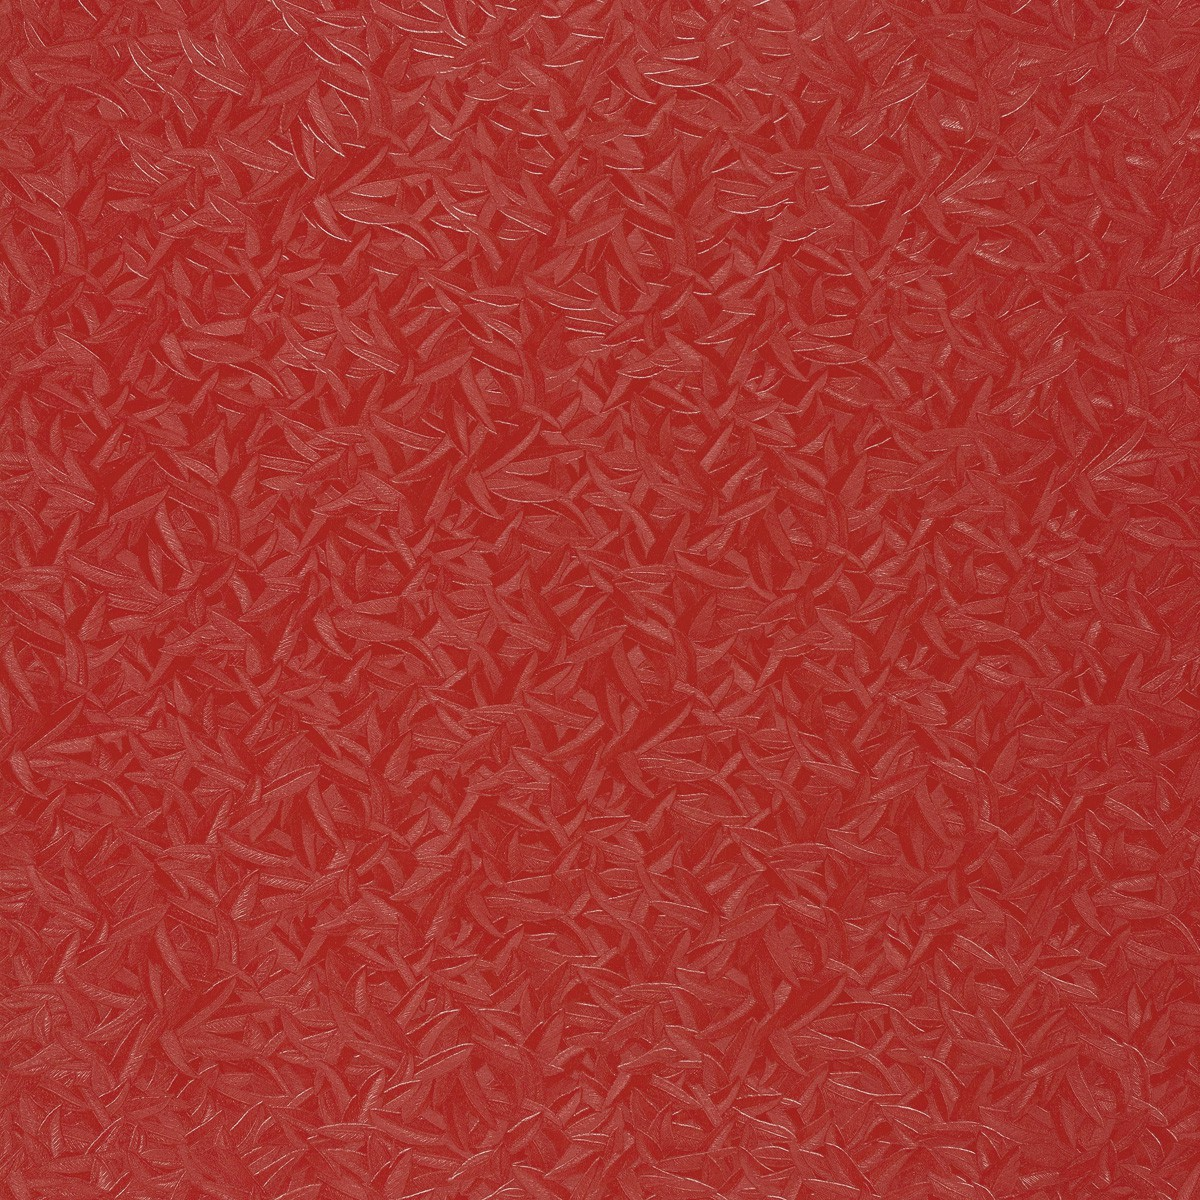 wandgestaltung jugendzimmer rot: wandgestaltung jugendzimmer rot ... - Tapete Rot Schlafzimmer